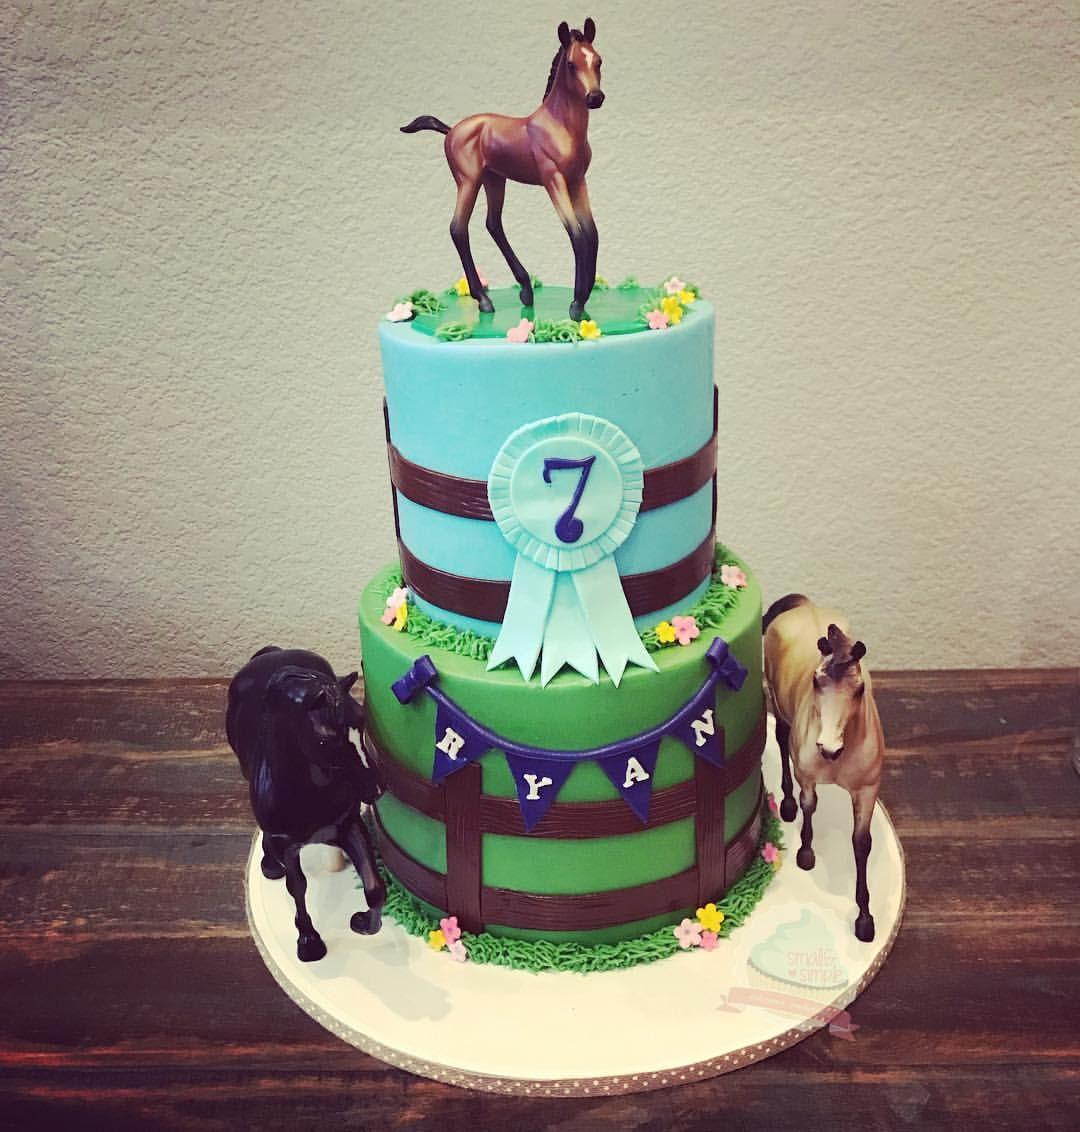 Horse cake smallandsimpleconfections